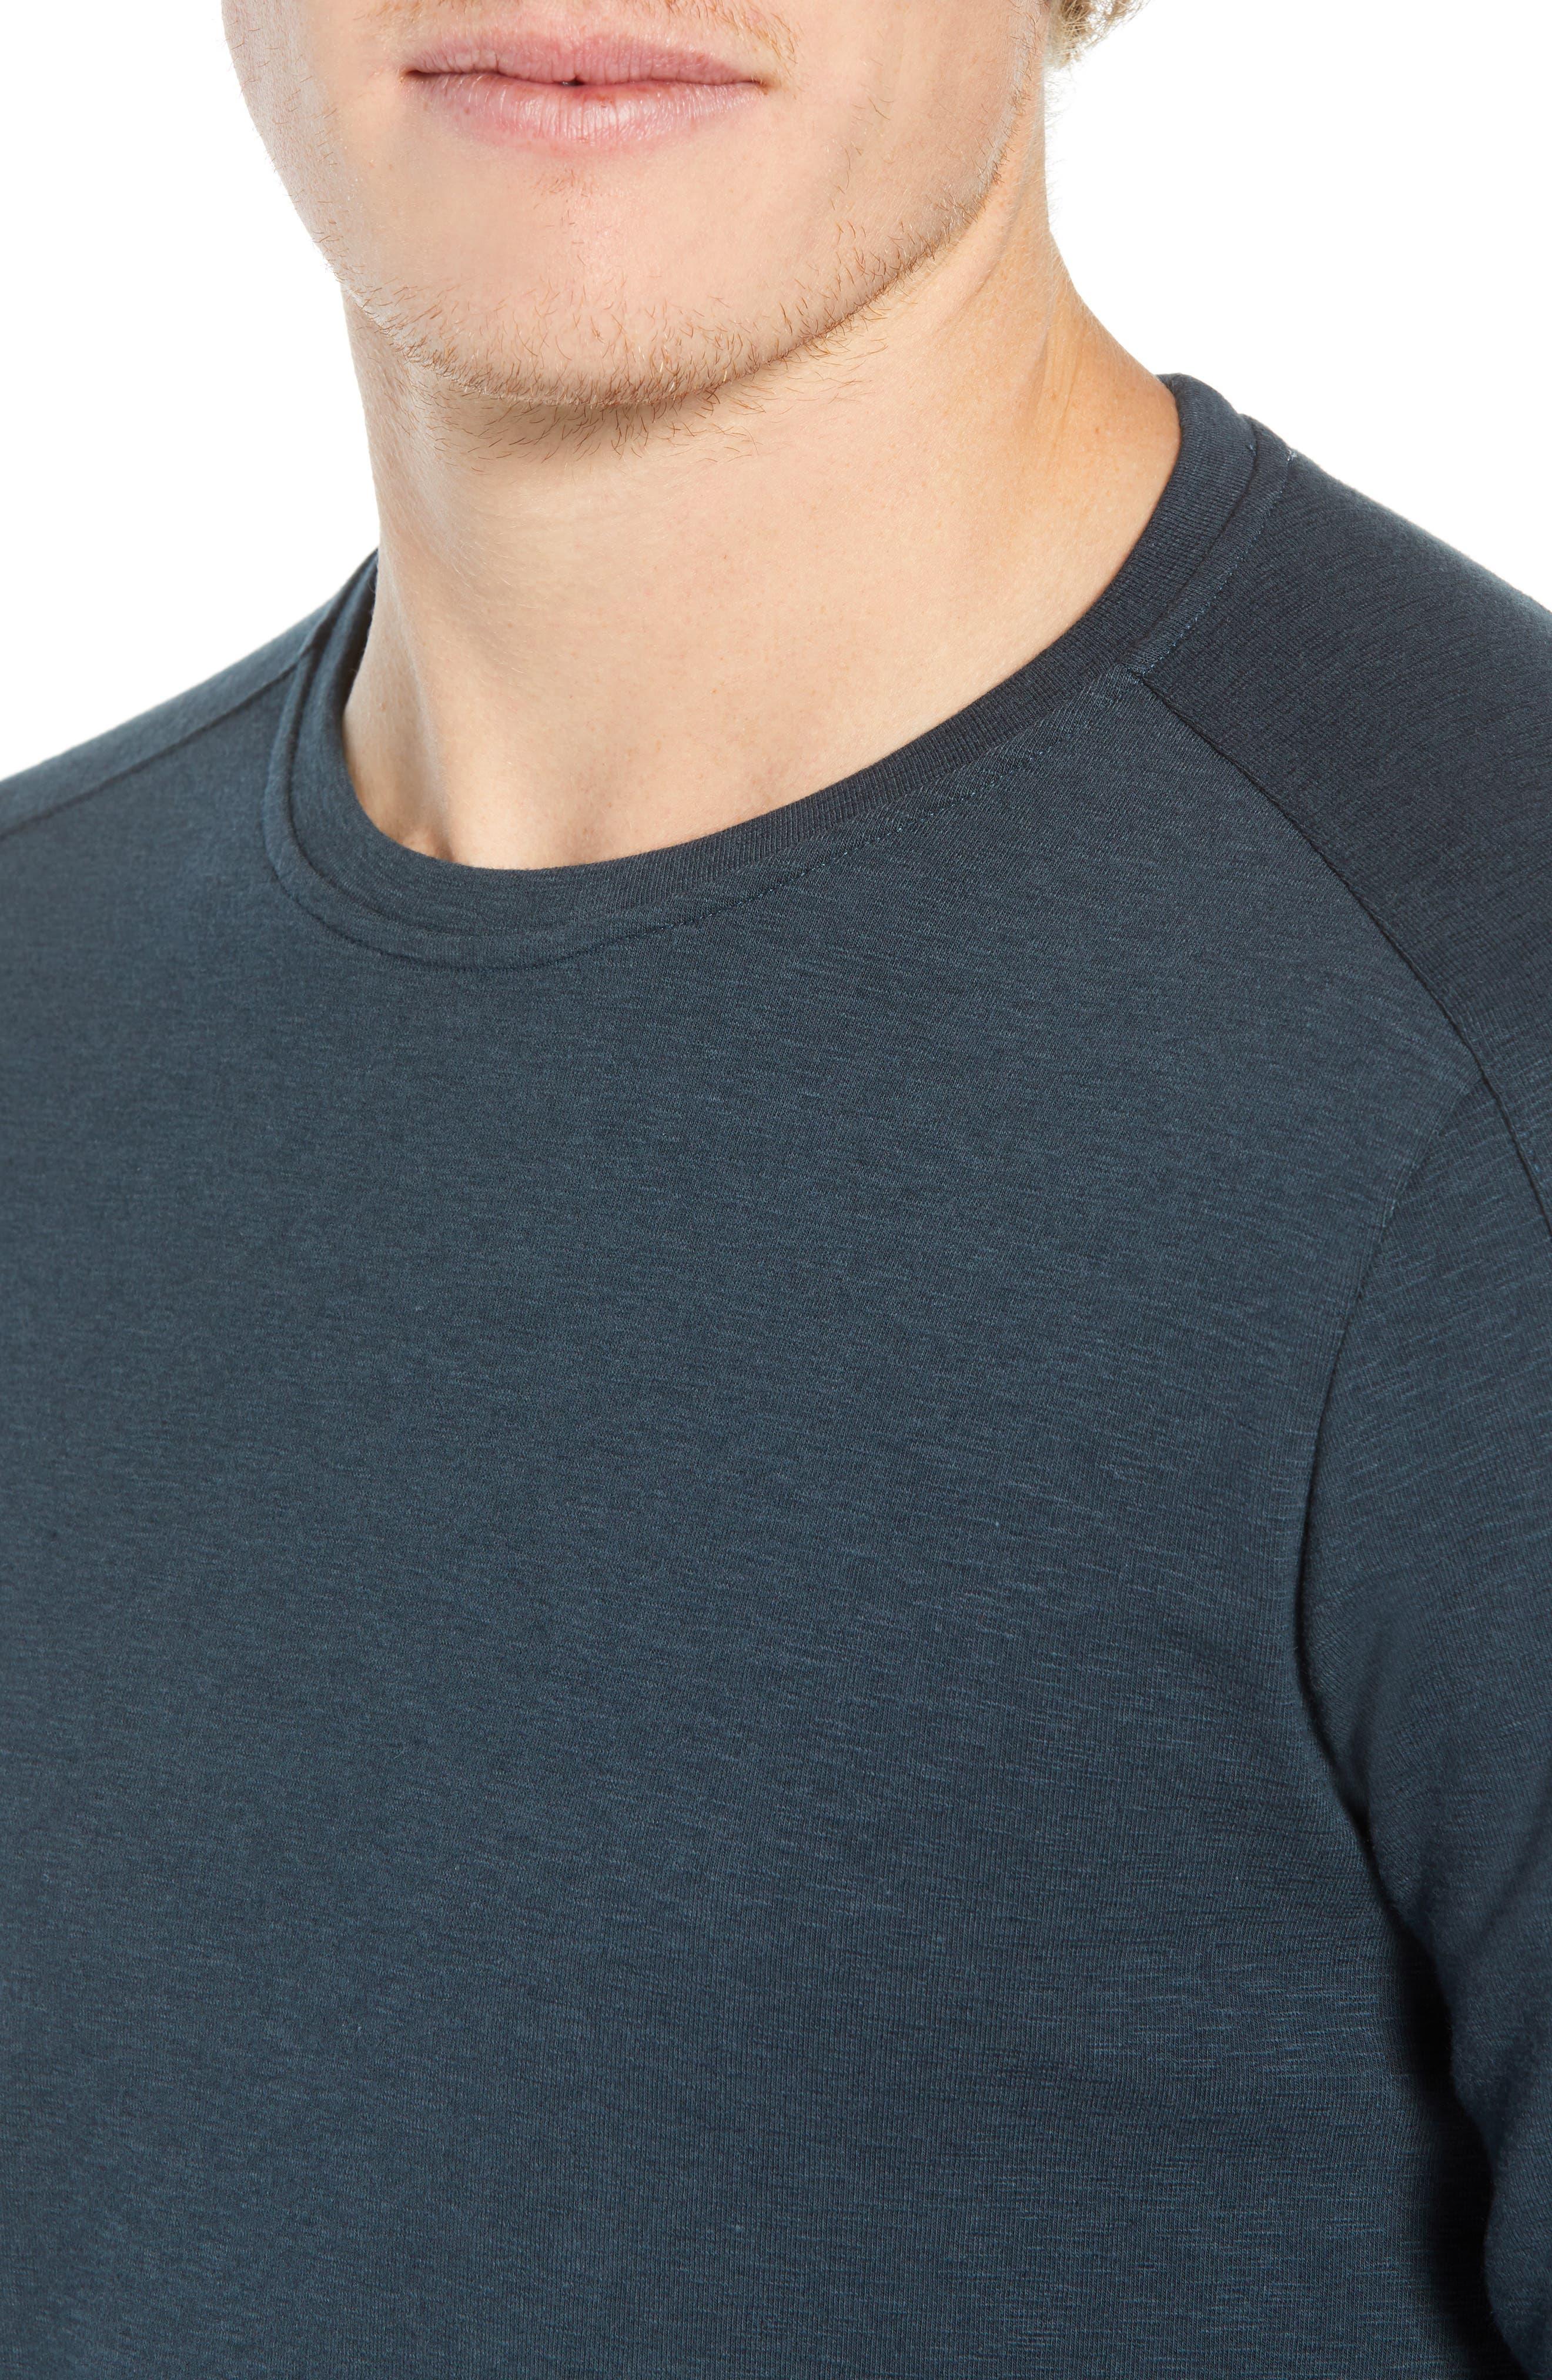 Douglas Slub Long Sleeve T-Shirt,                             Alternate thumbnail 4, color,                             TEAL